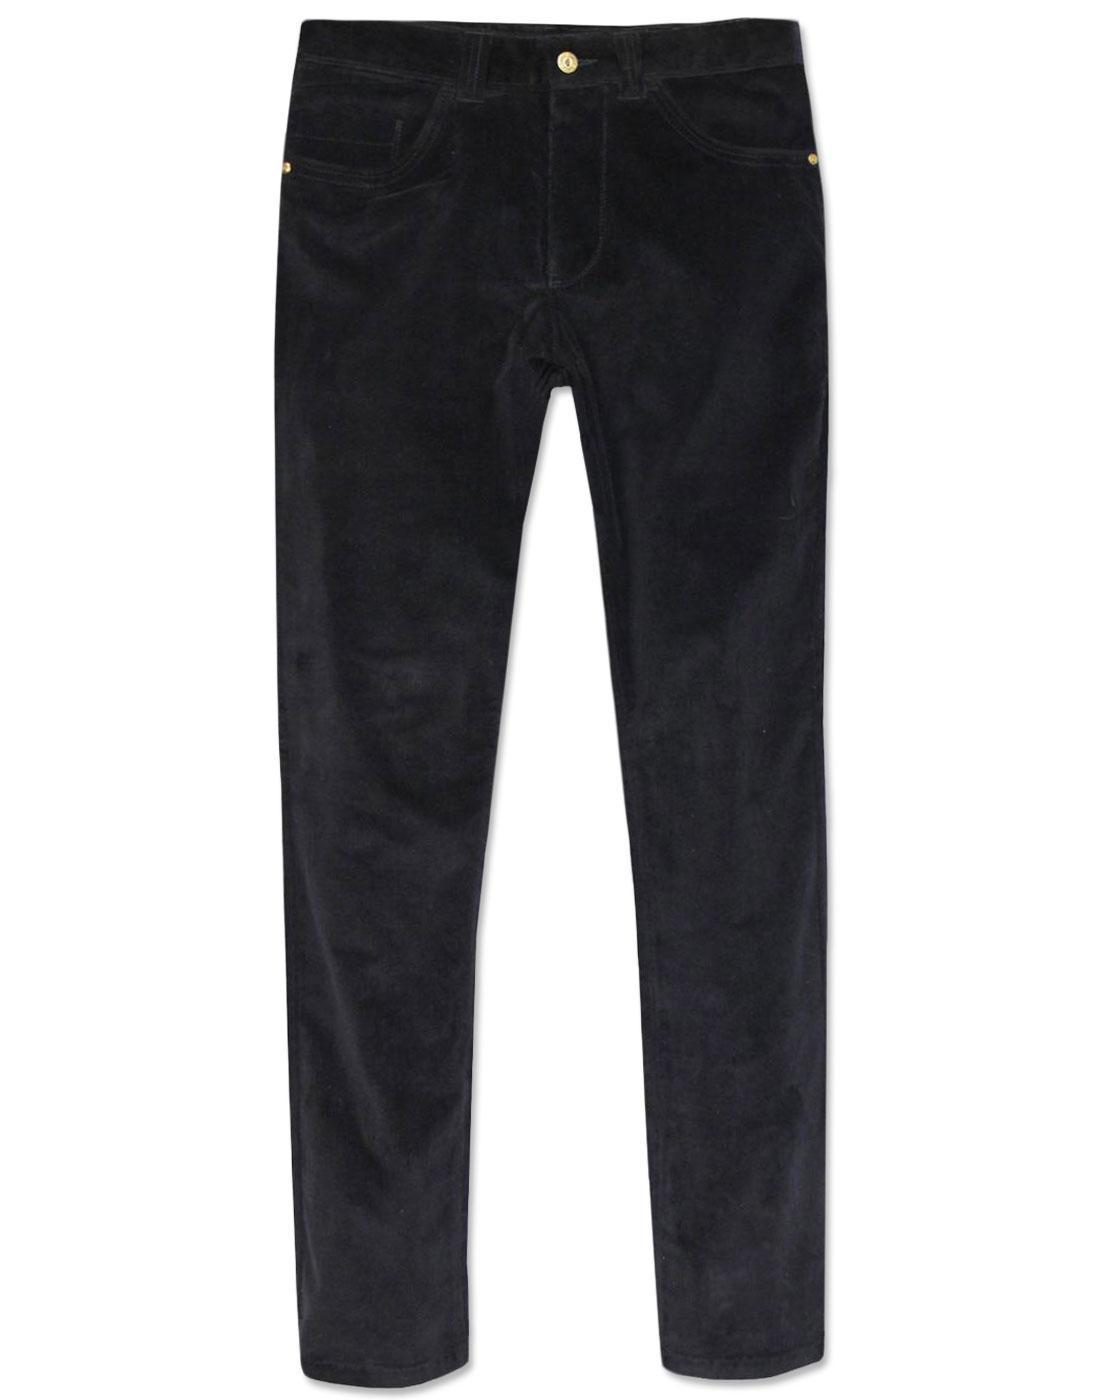 Robson GABICCI VINTAGE Mod Slim Cord Trousers (B)